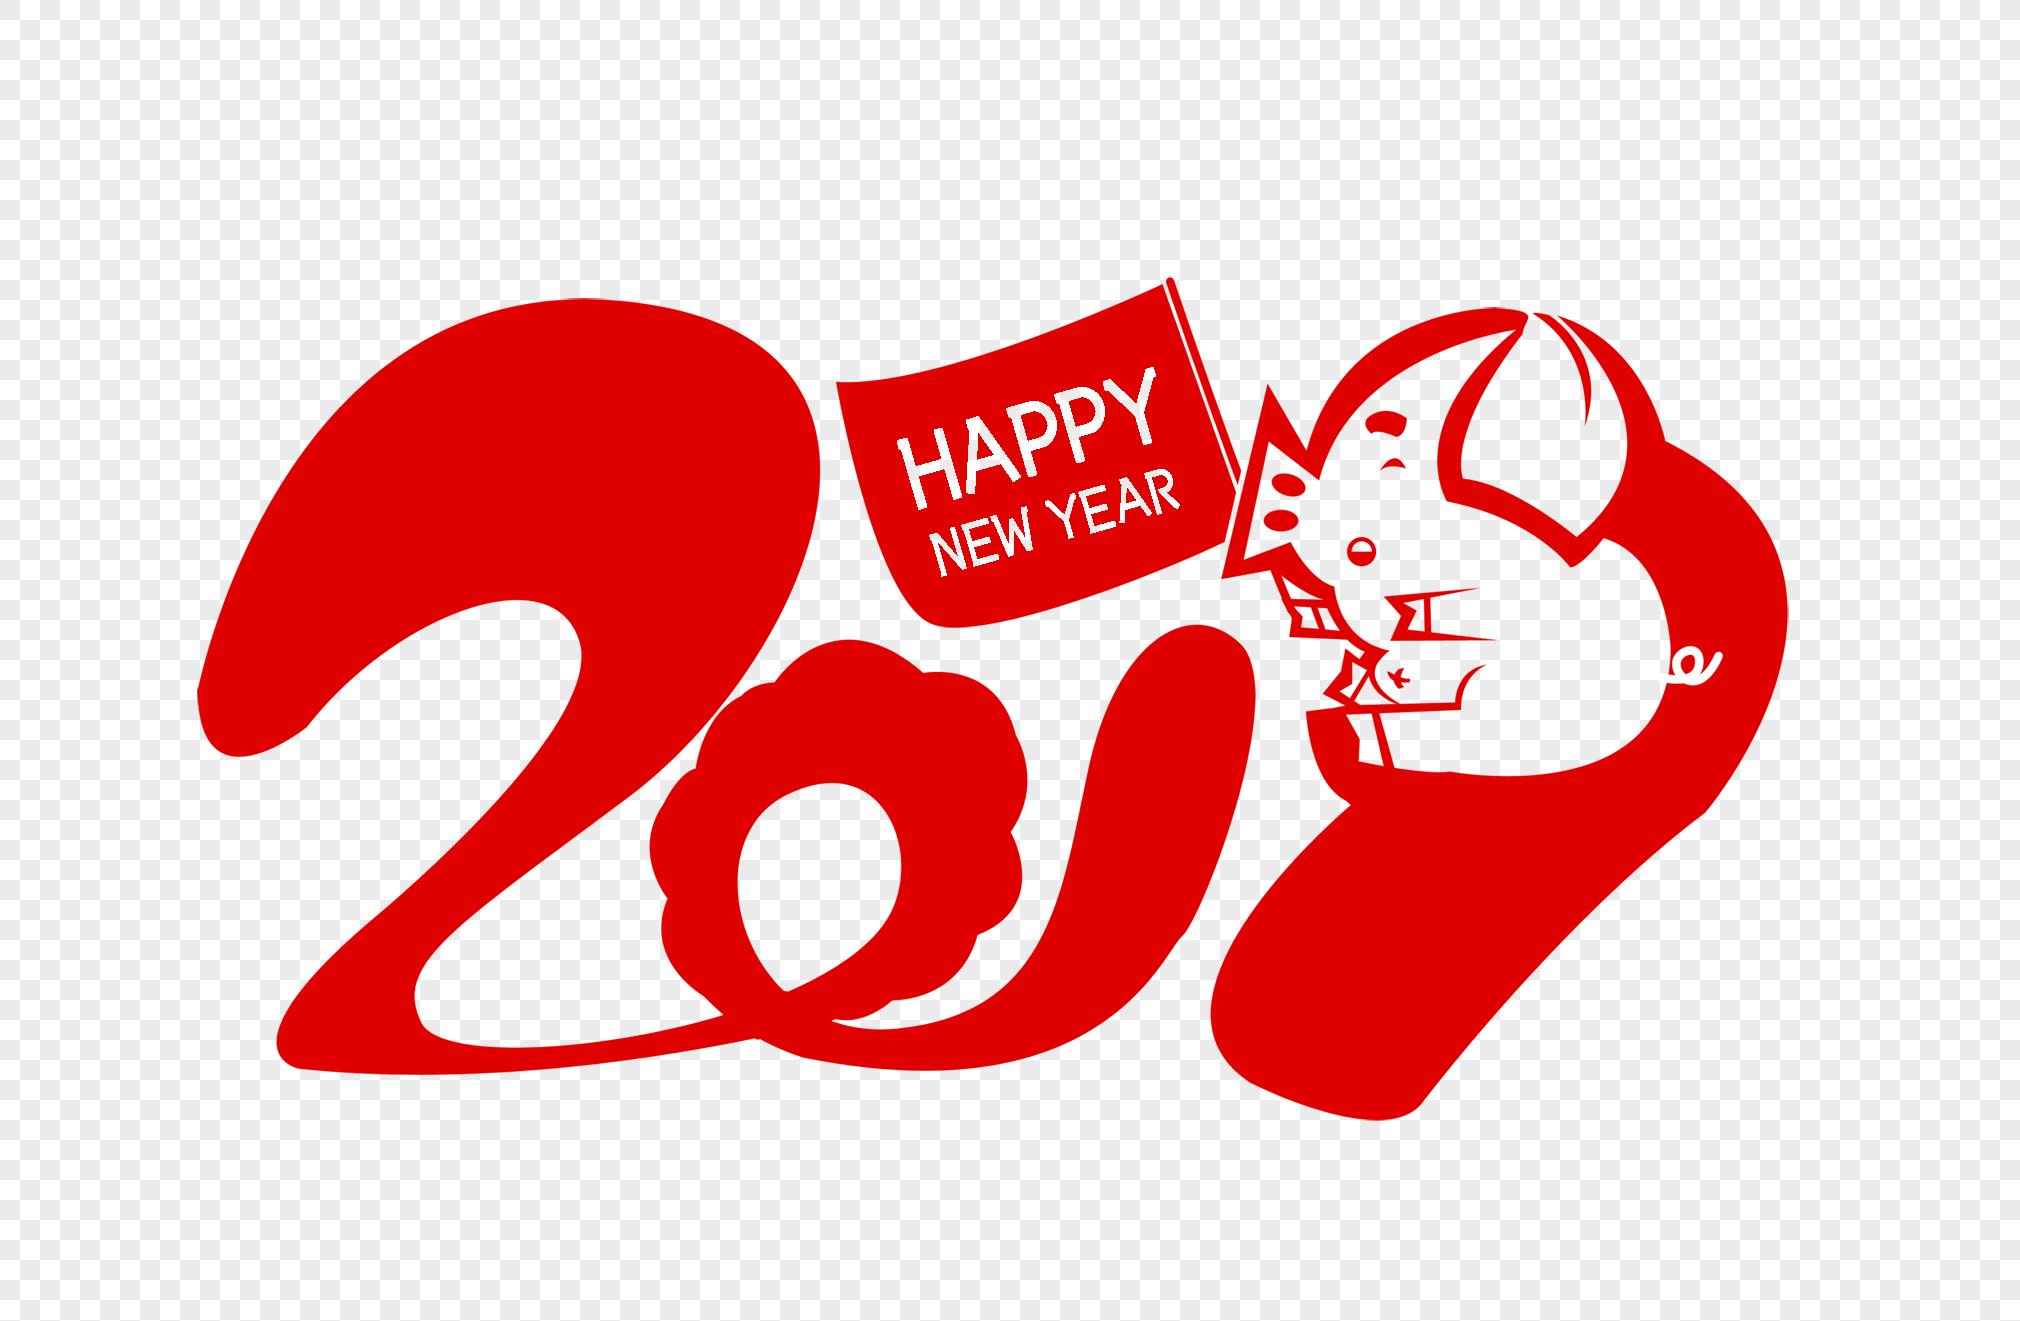 originality 2019 font design for pig year png image